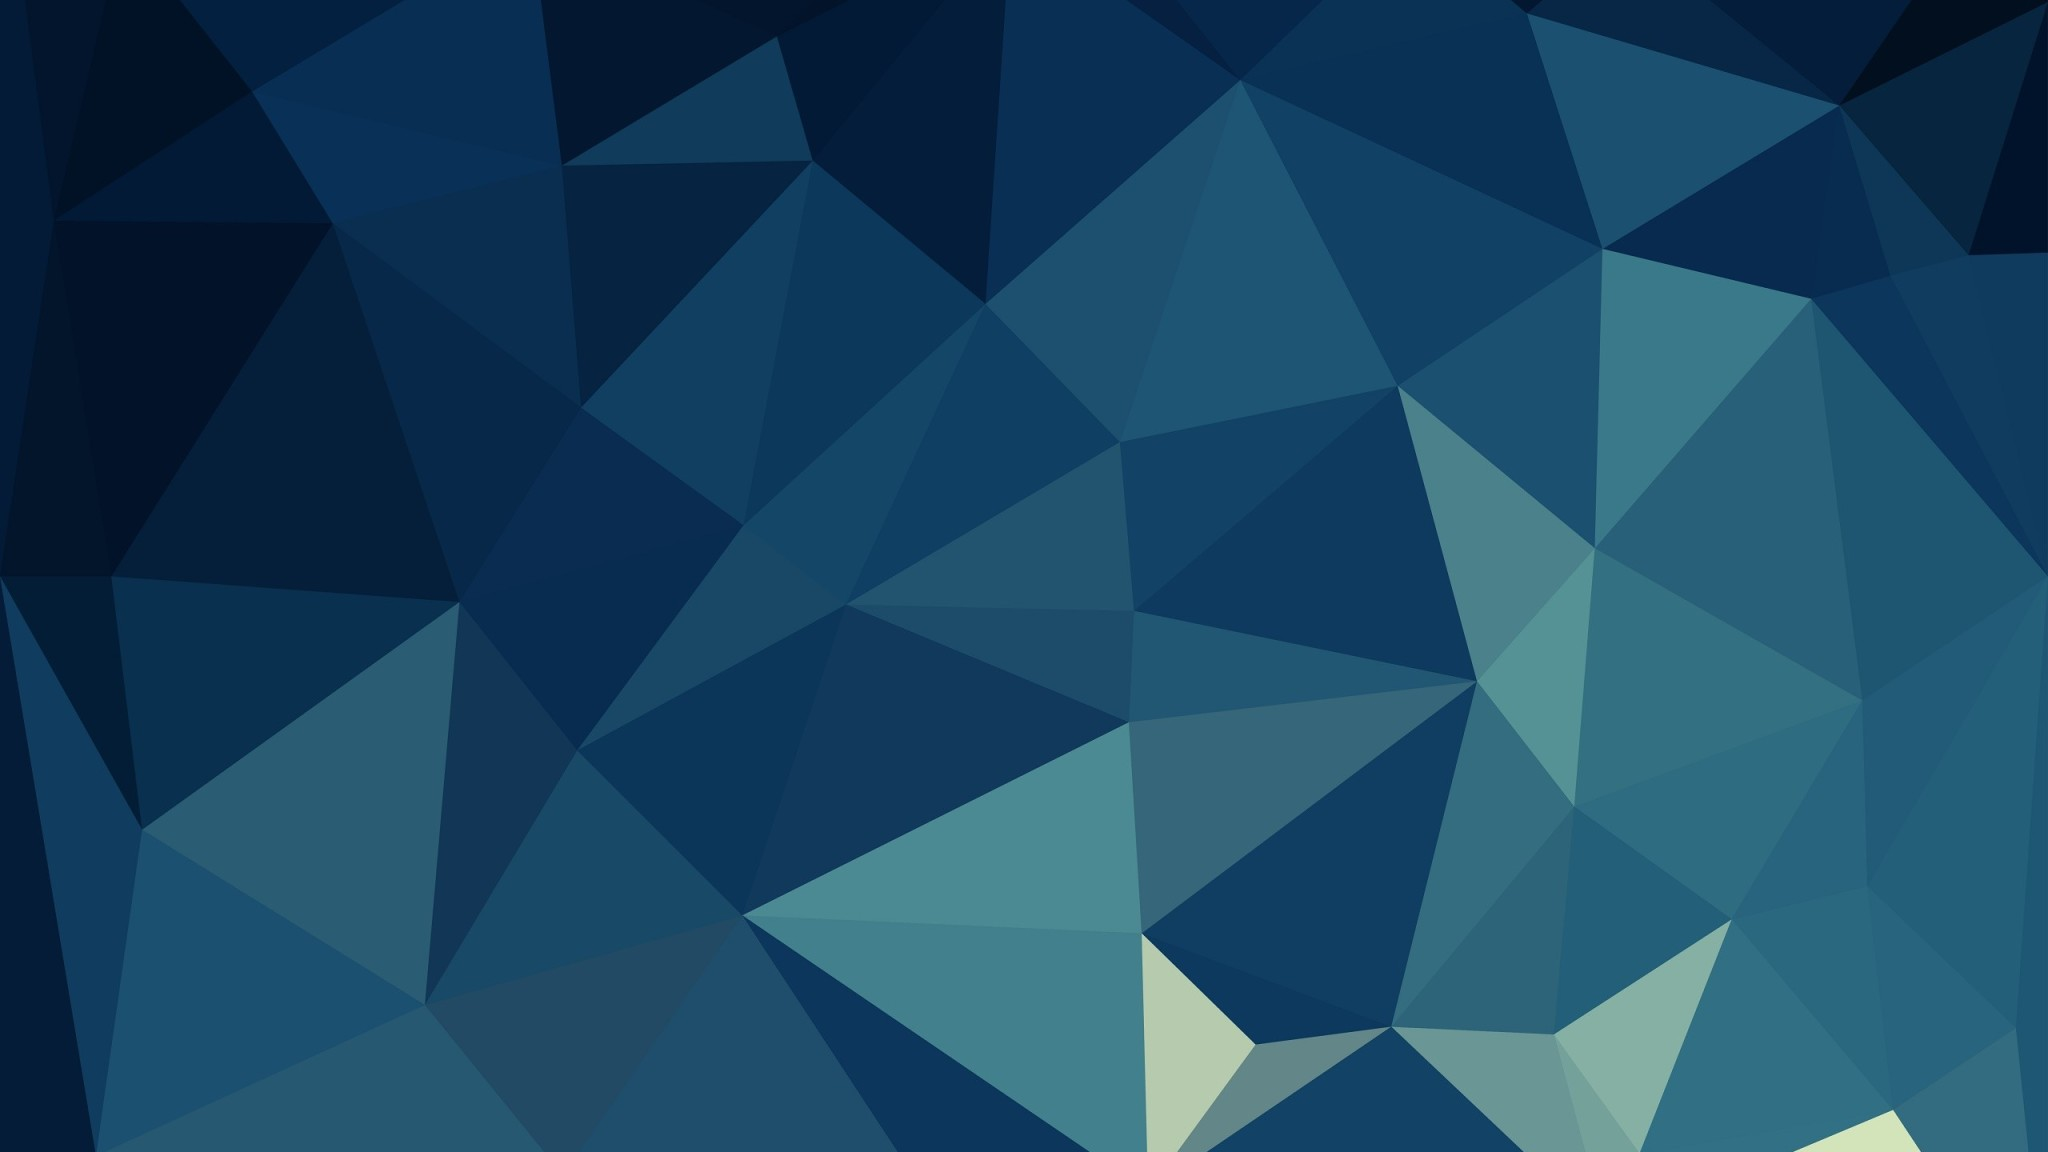 2048 X 1152の青いバナー 2048によって1152壁紙 2048x1152 Wallpapertip